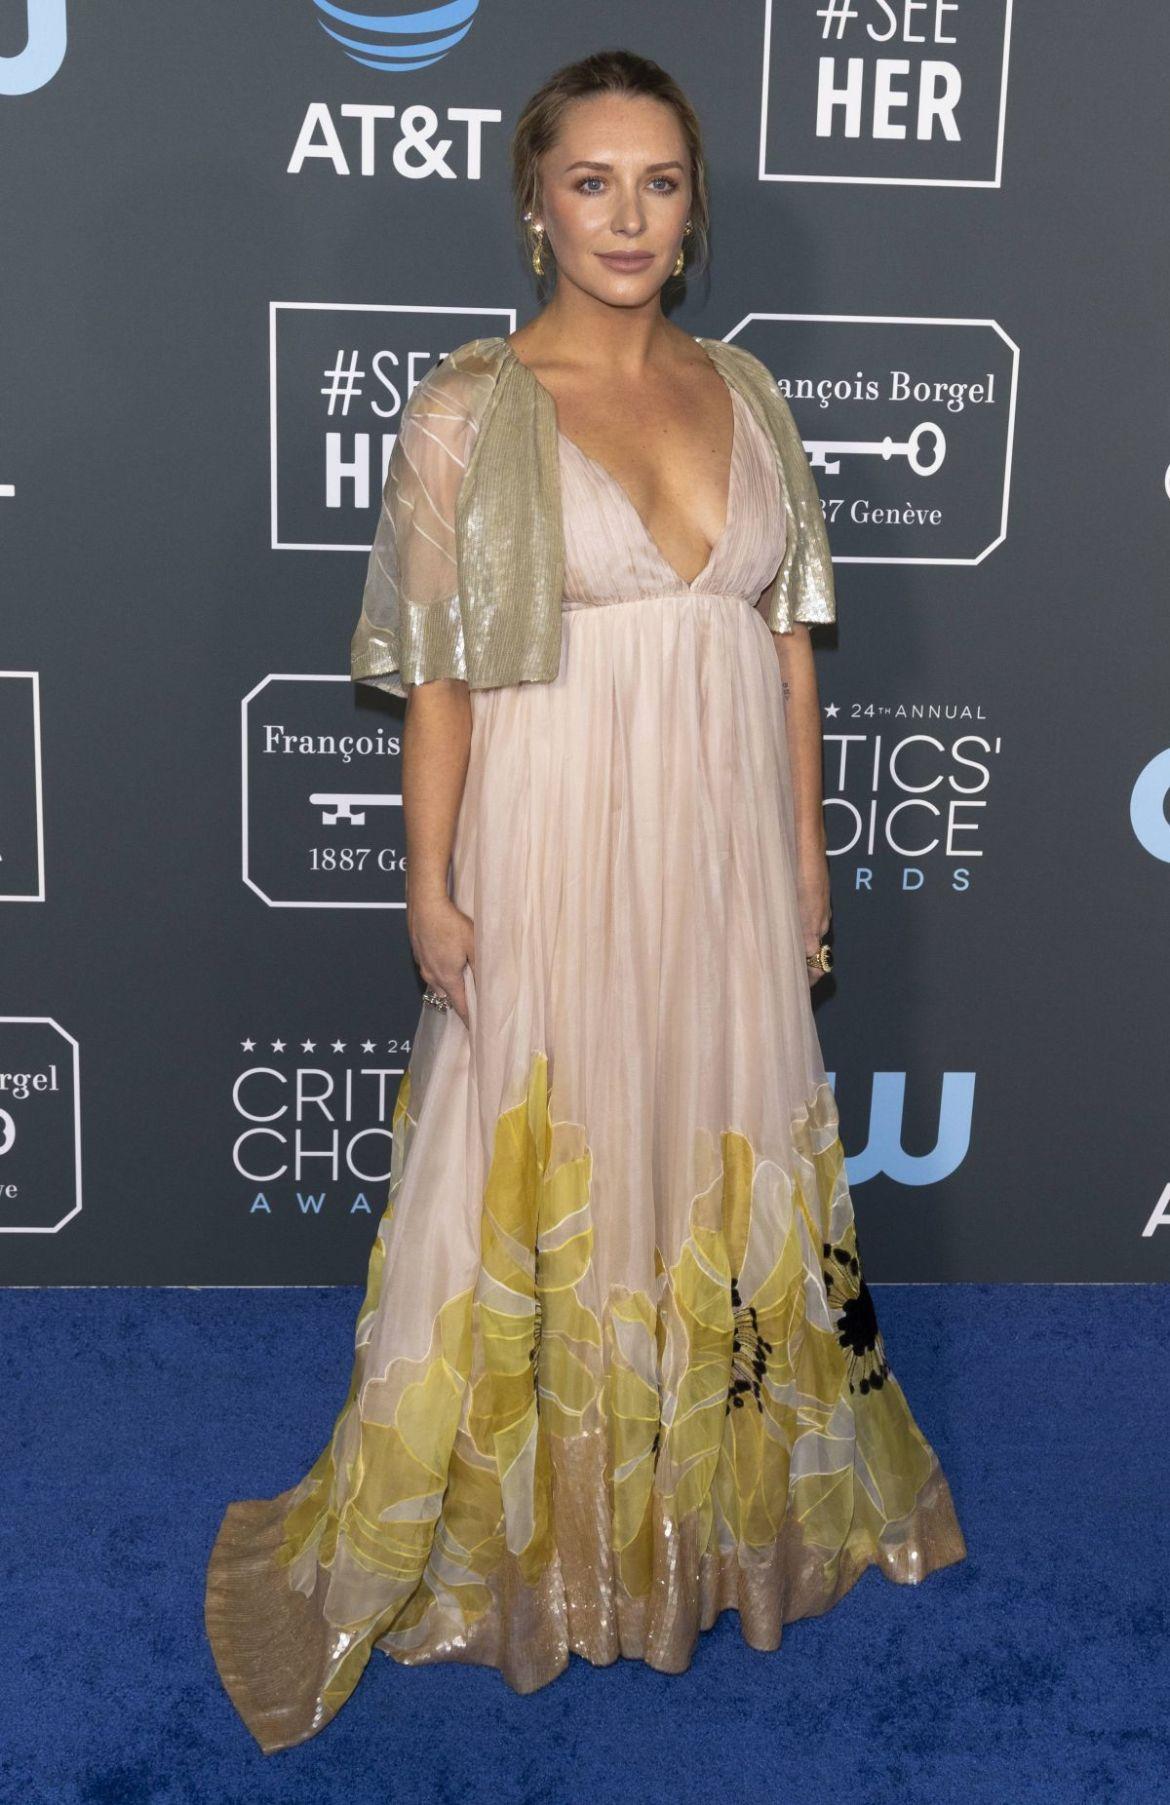 ANNIE STARKE at 2019 Critics' Choice Awards in Santa Monica 01/13/2019